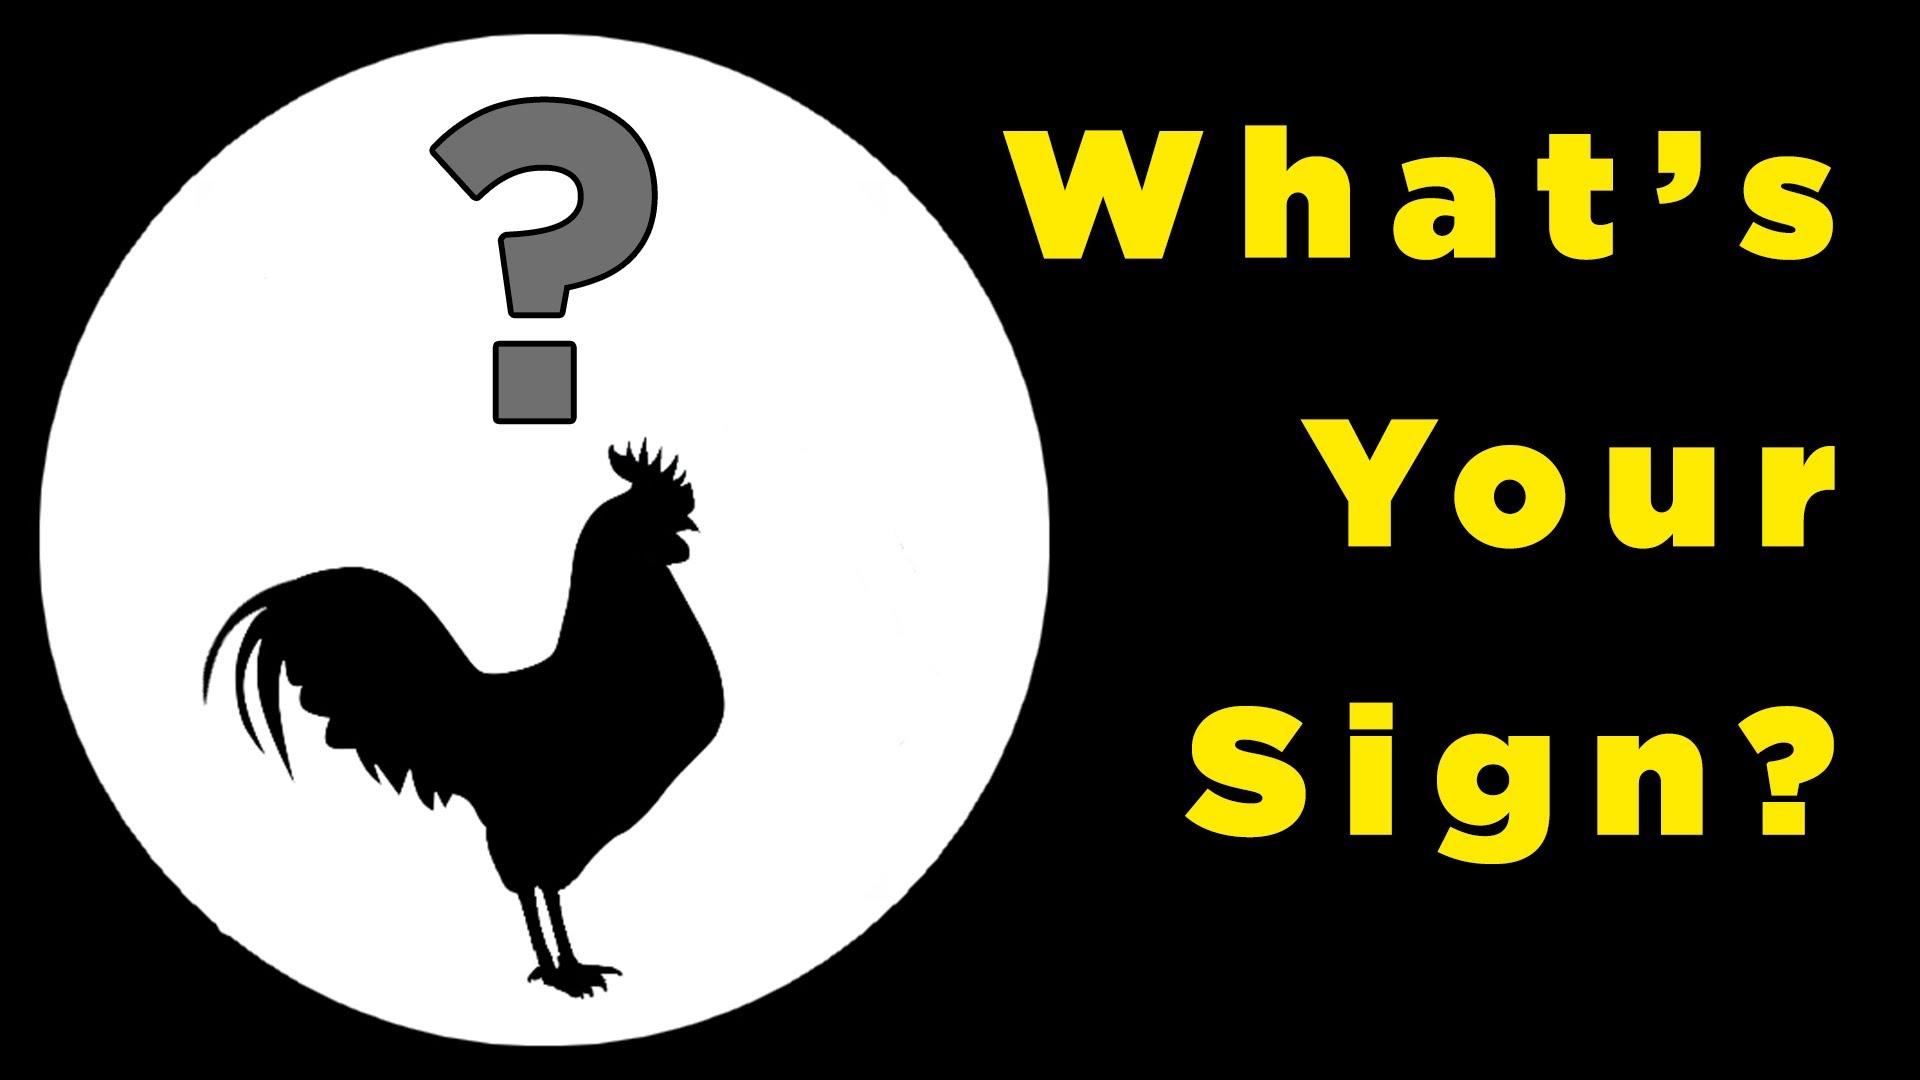 Taurus Horoscope 2014 2014 Taurus Horoscope Taurus